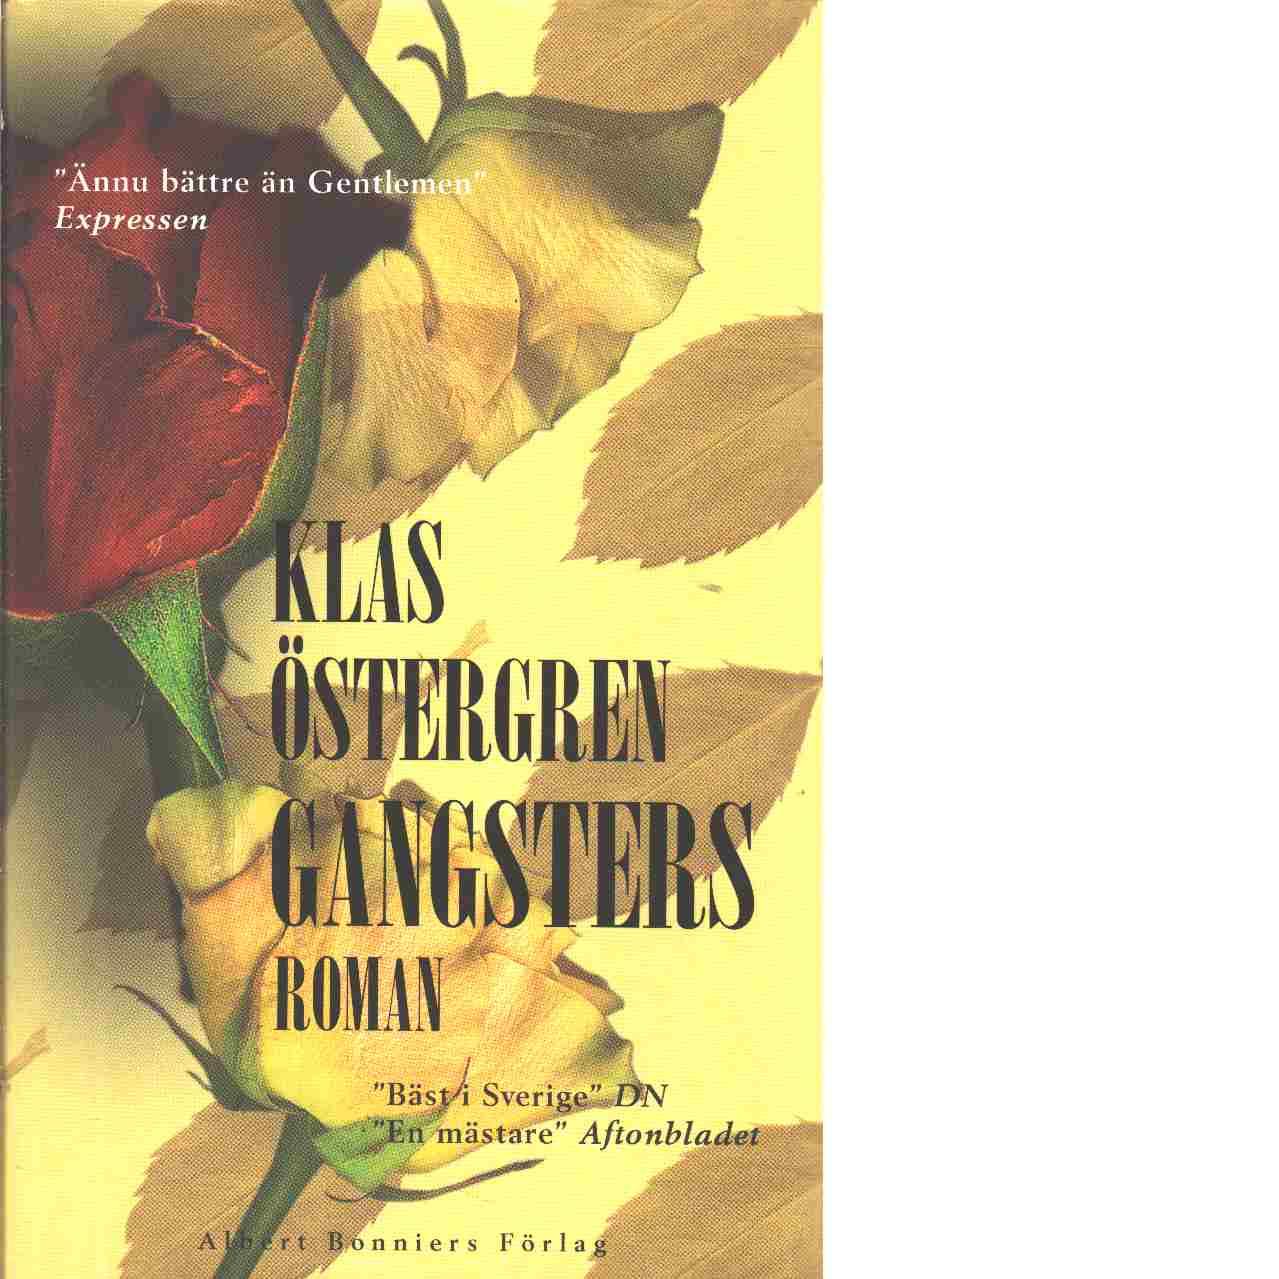 Gangsters : roman - Östergren, Klas